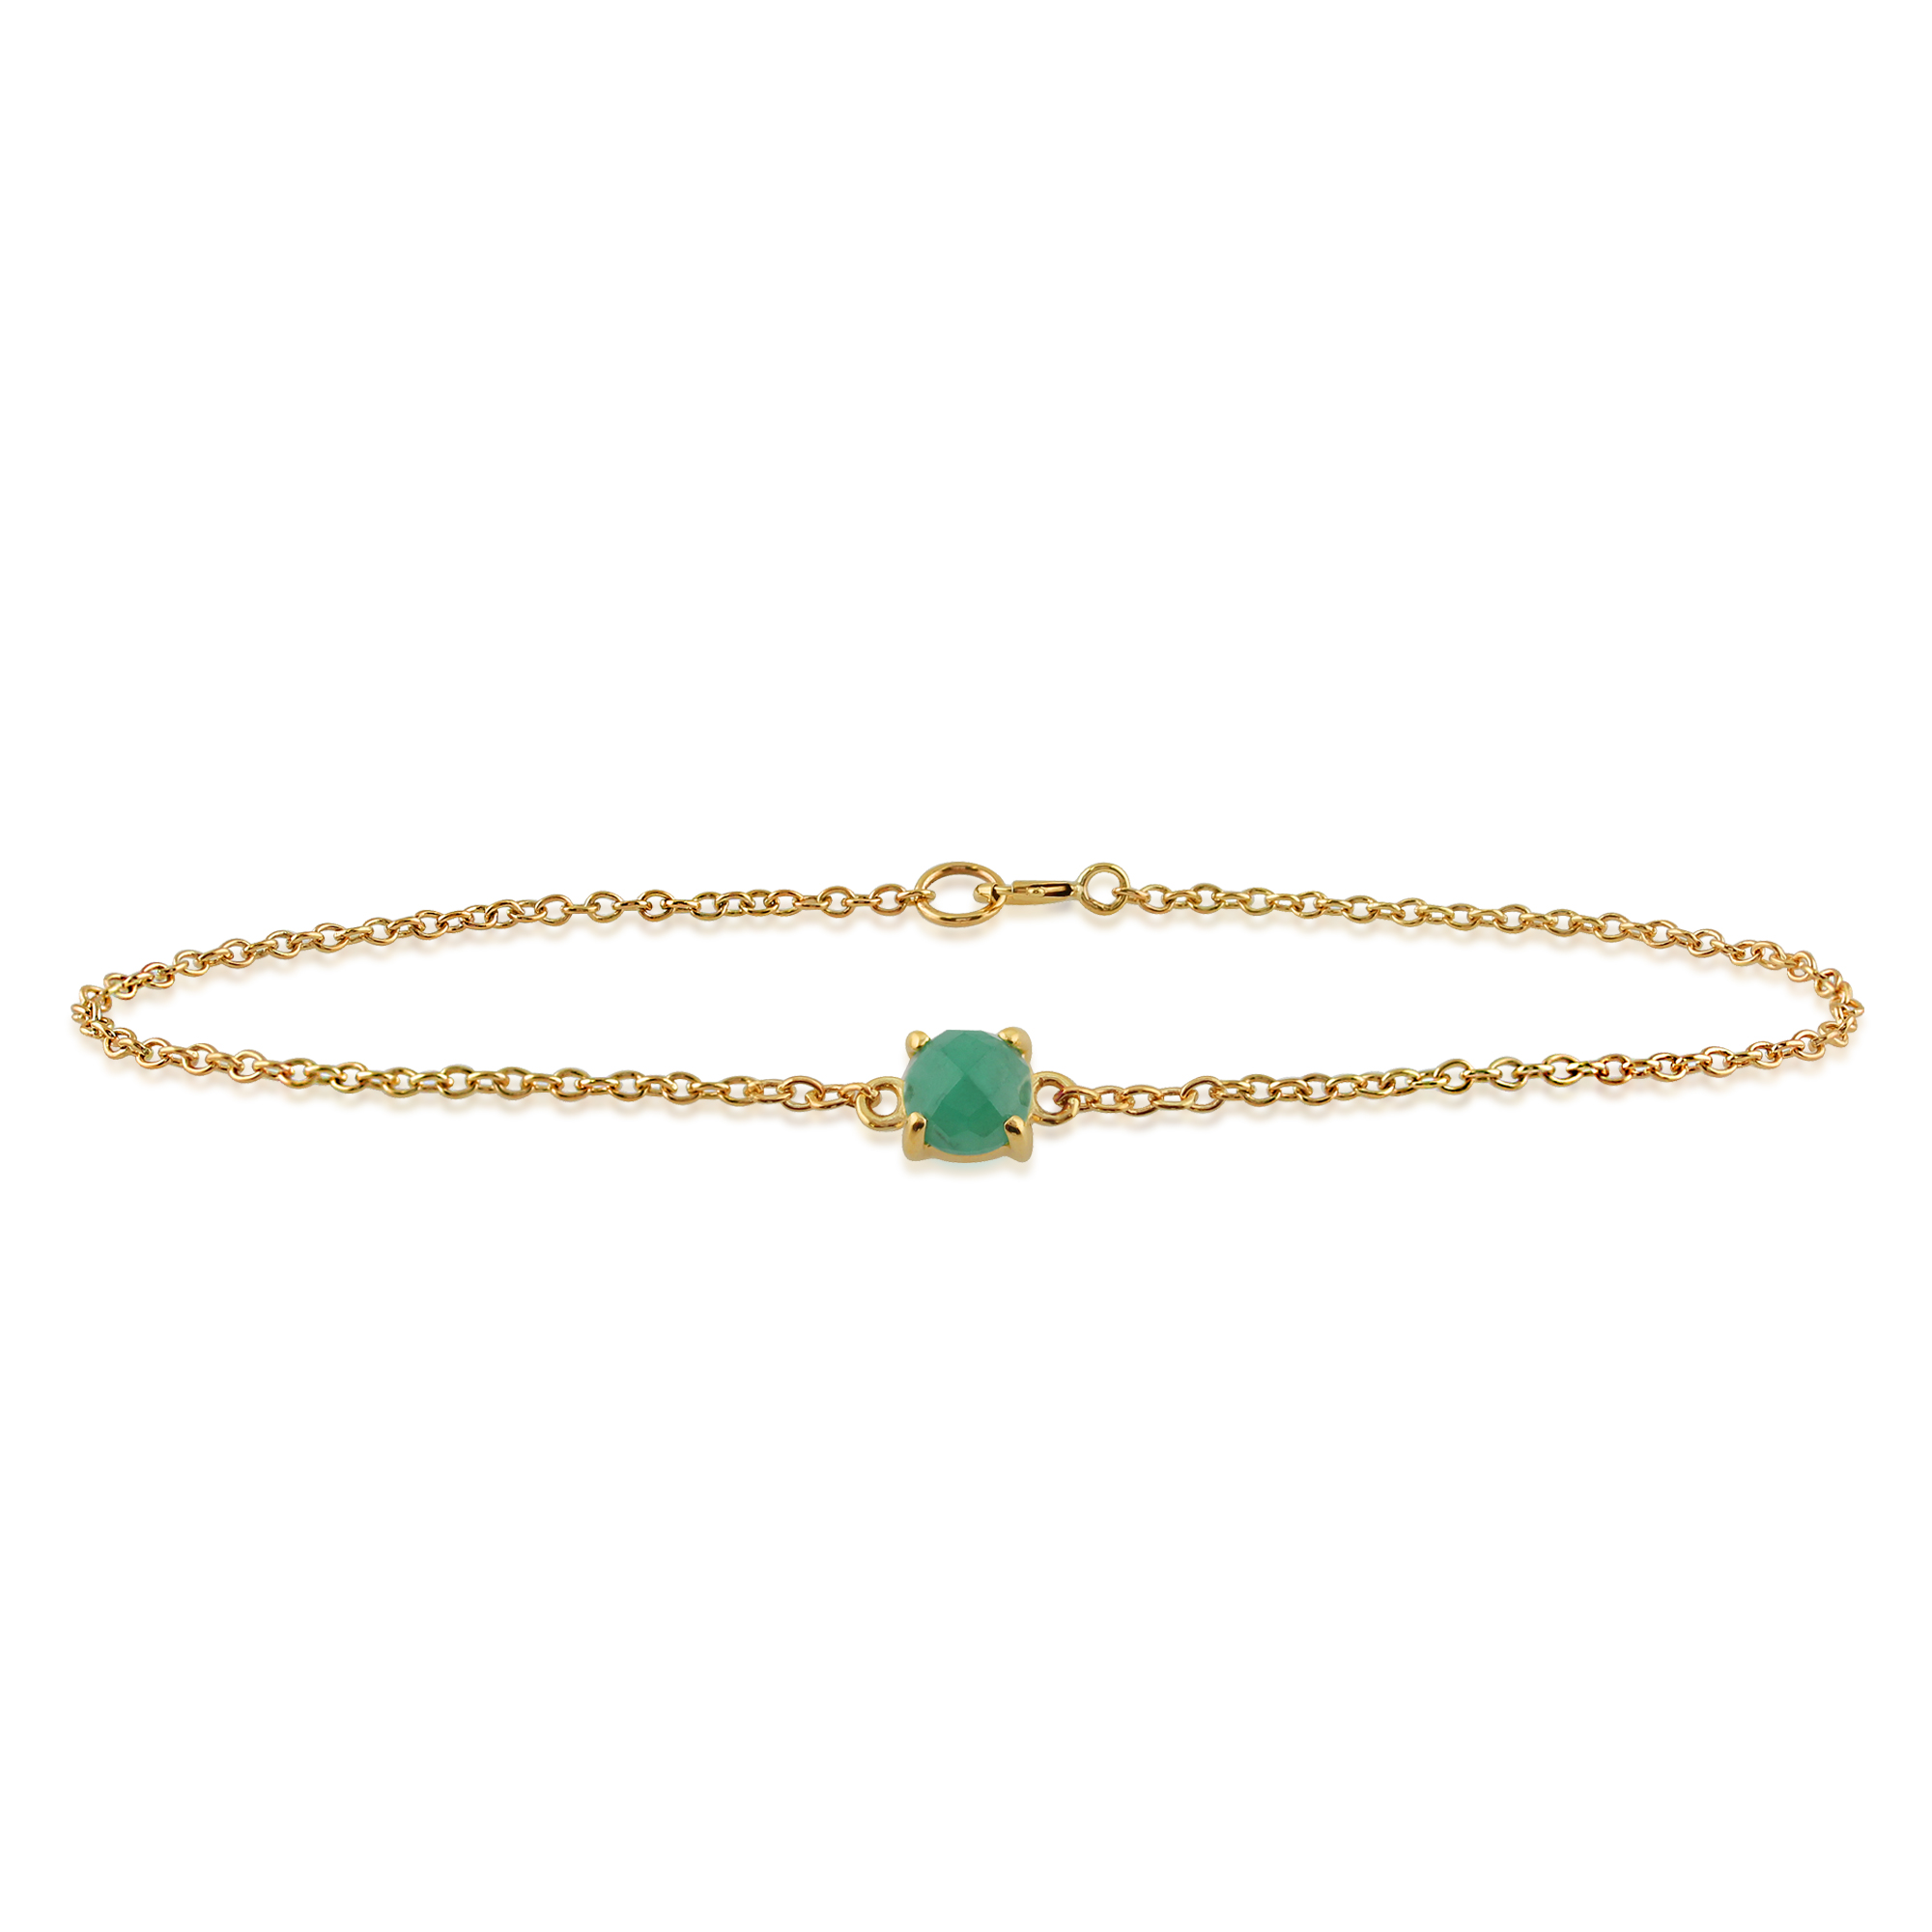 Amour Damier 9ct Yellow Gold 0.4ct Emerald Checkerboard 19cm Bracelet by Gemondo